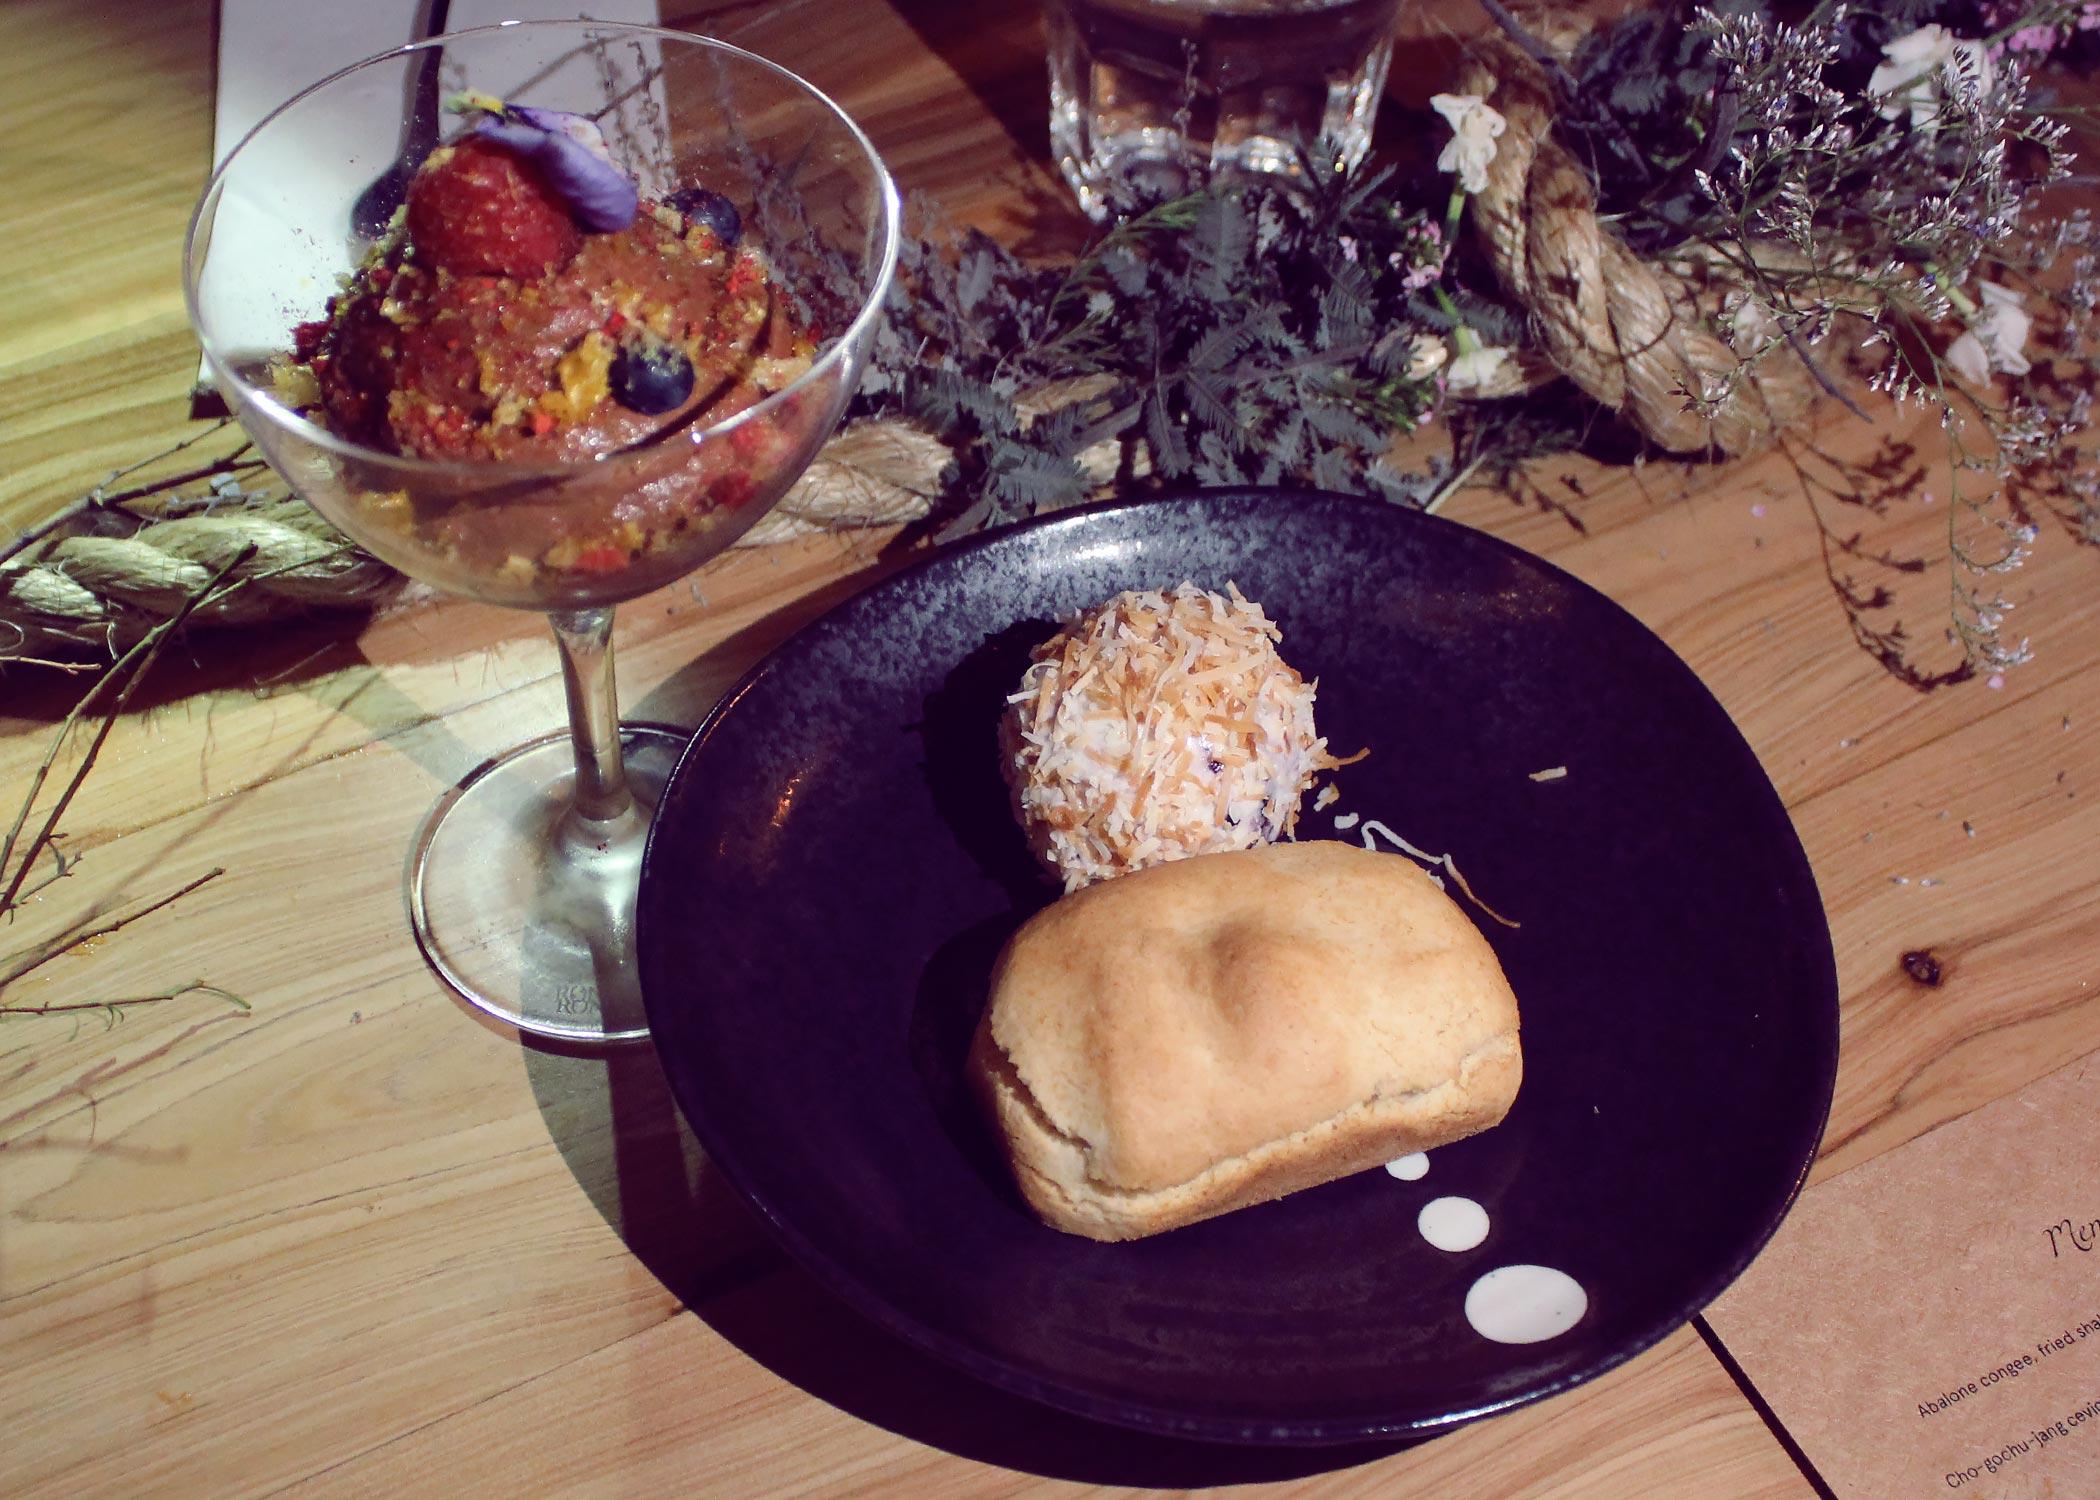 Valhrona chocolate mousse, fresh & freeze dried raspberries + Taiwanese pineapple cake, yuzu granita.